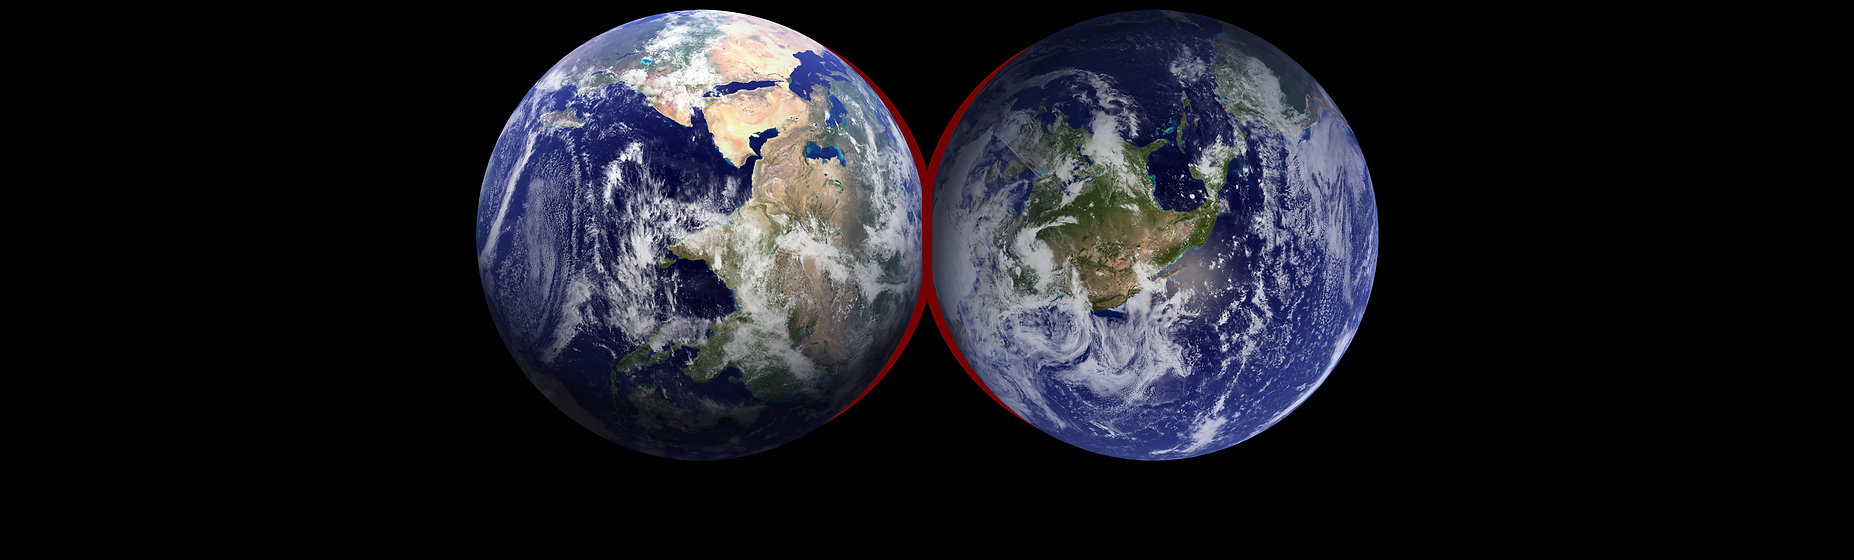 Earths 2aAa 3832x2048 on canvas 7330x221